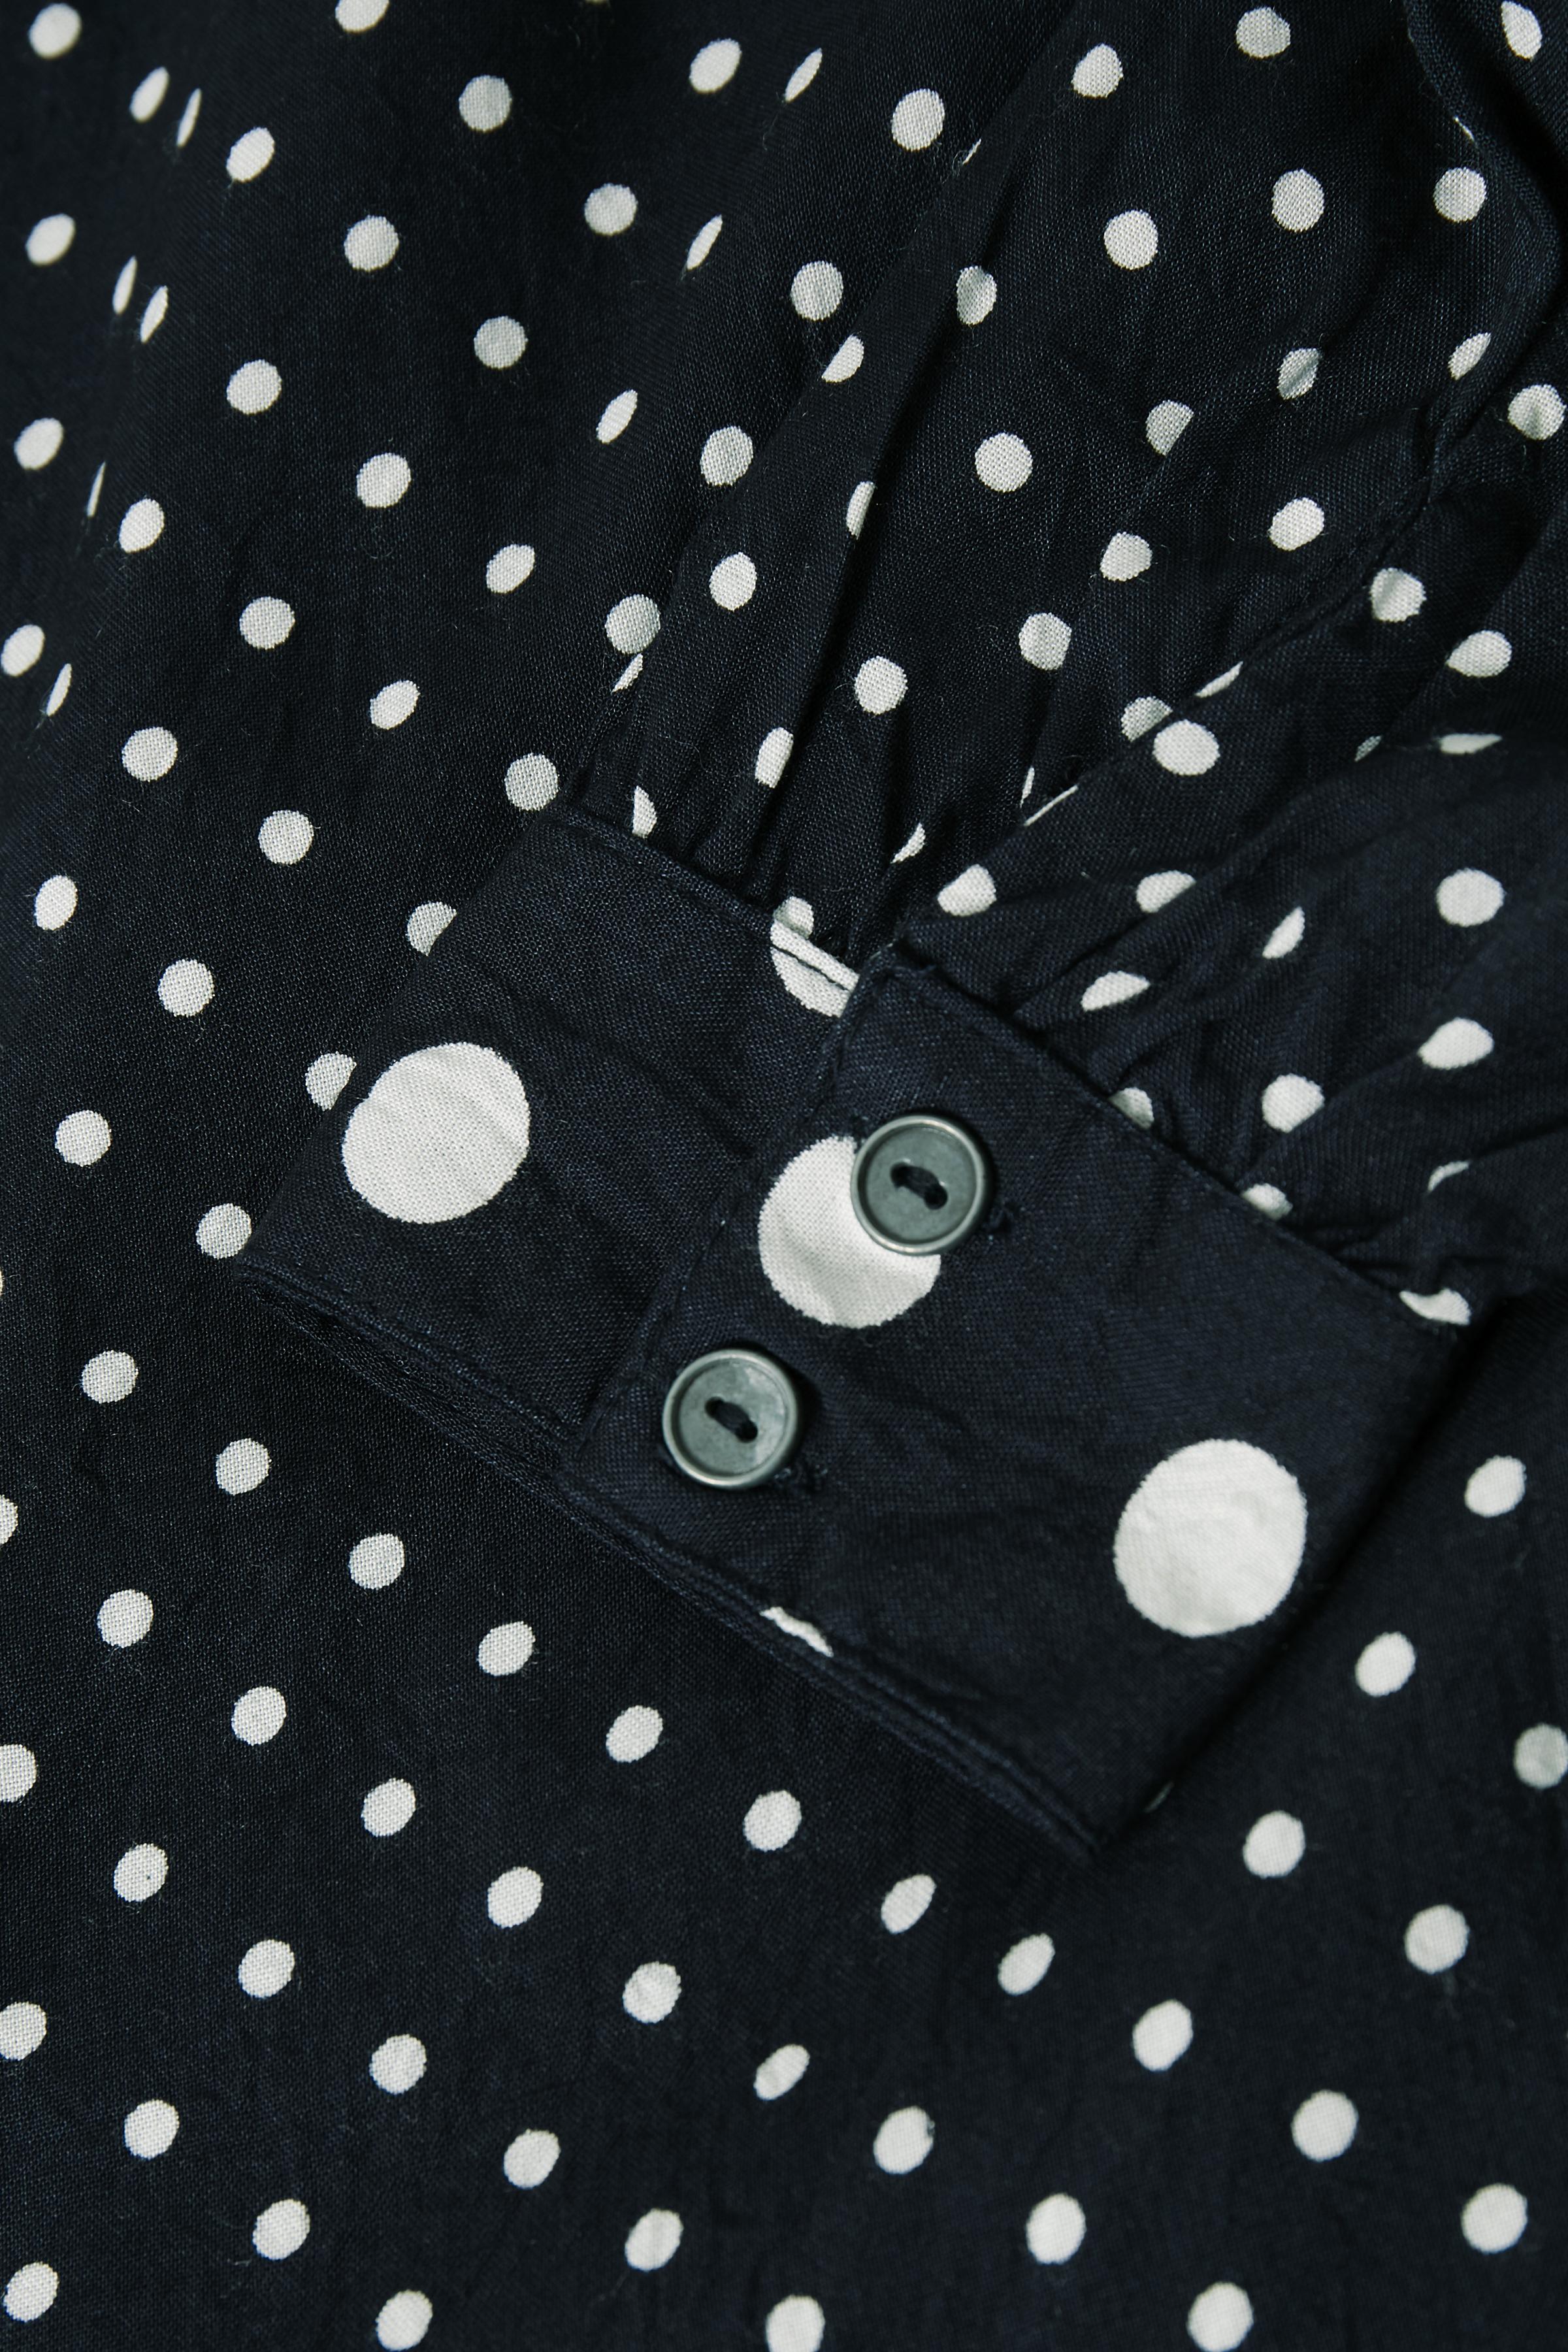 Marineblau/weiß Langarm-Bluse  von Kaffe – Shoppen Sie Marineblau/weiß Langarm-Bluse  ab Gr. 34-46 hier